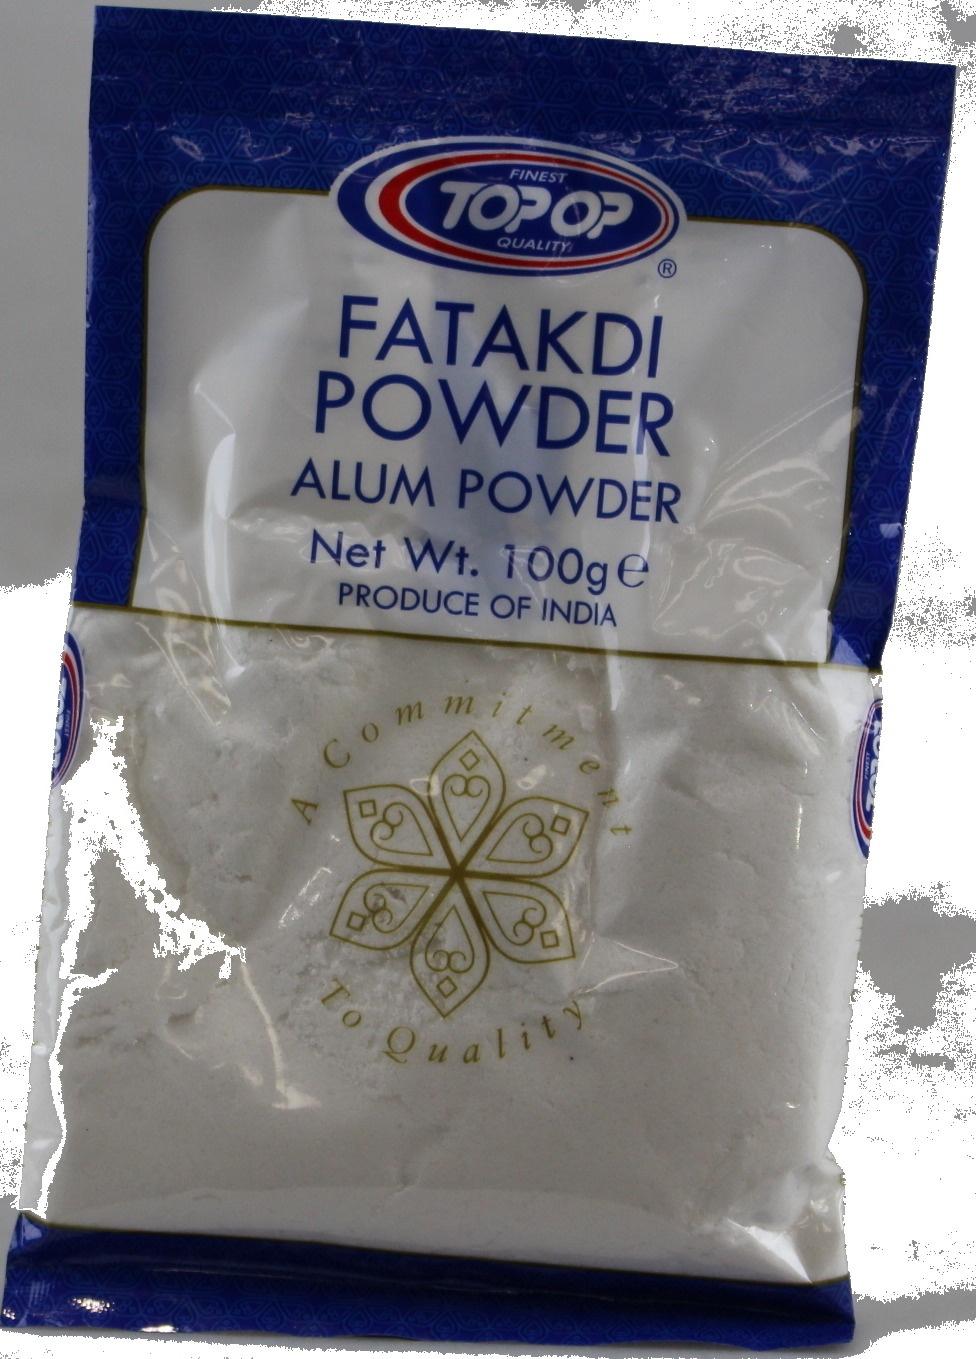 Crazee Deal Alum Powder Anti-Bacterial Deodorant Fatakdi Powder Potassium  Sulphate 100G